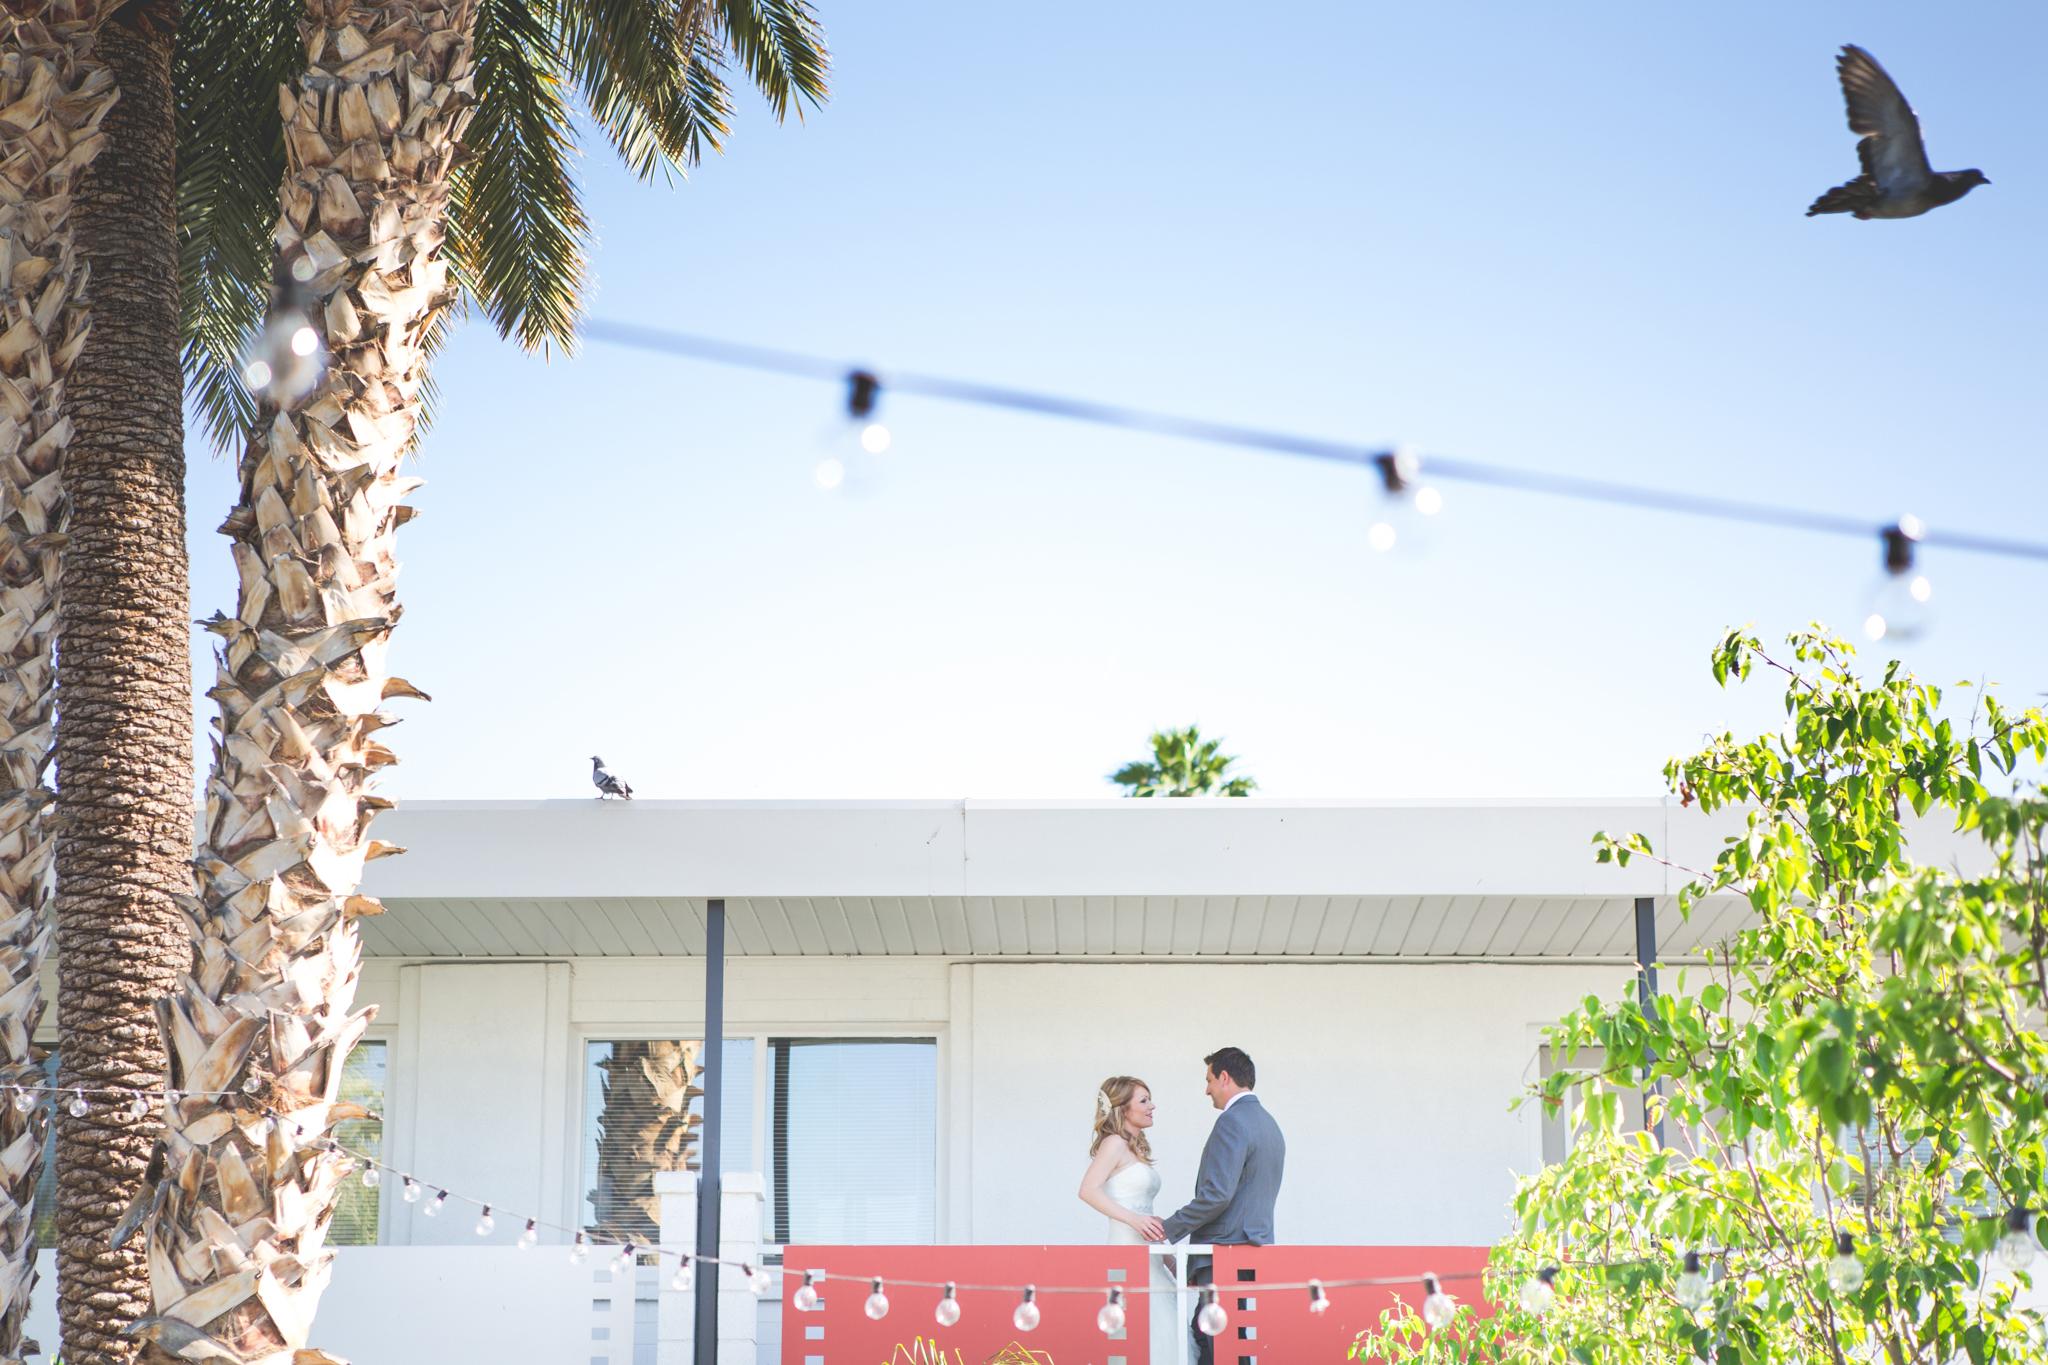 scottsdale-wedding-photographer-el-dorado-cool-bride-groom-portrait-bird